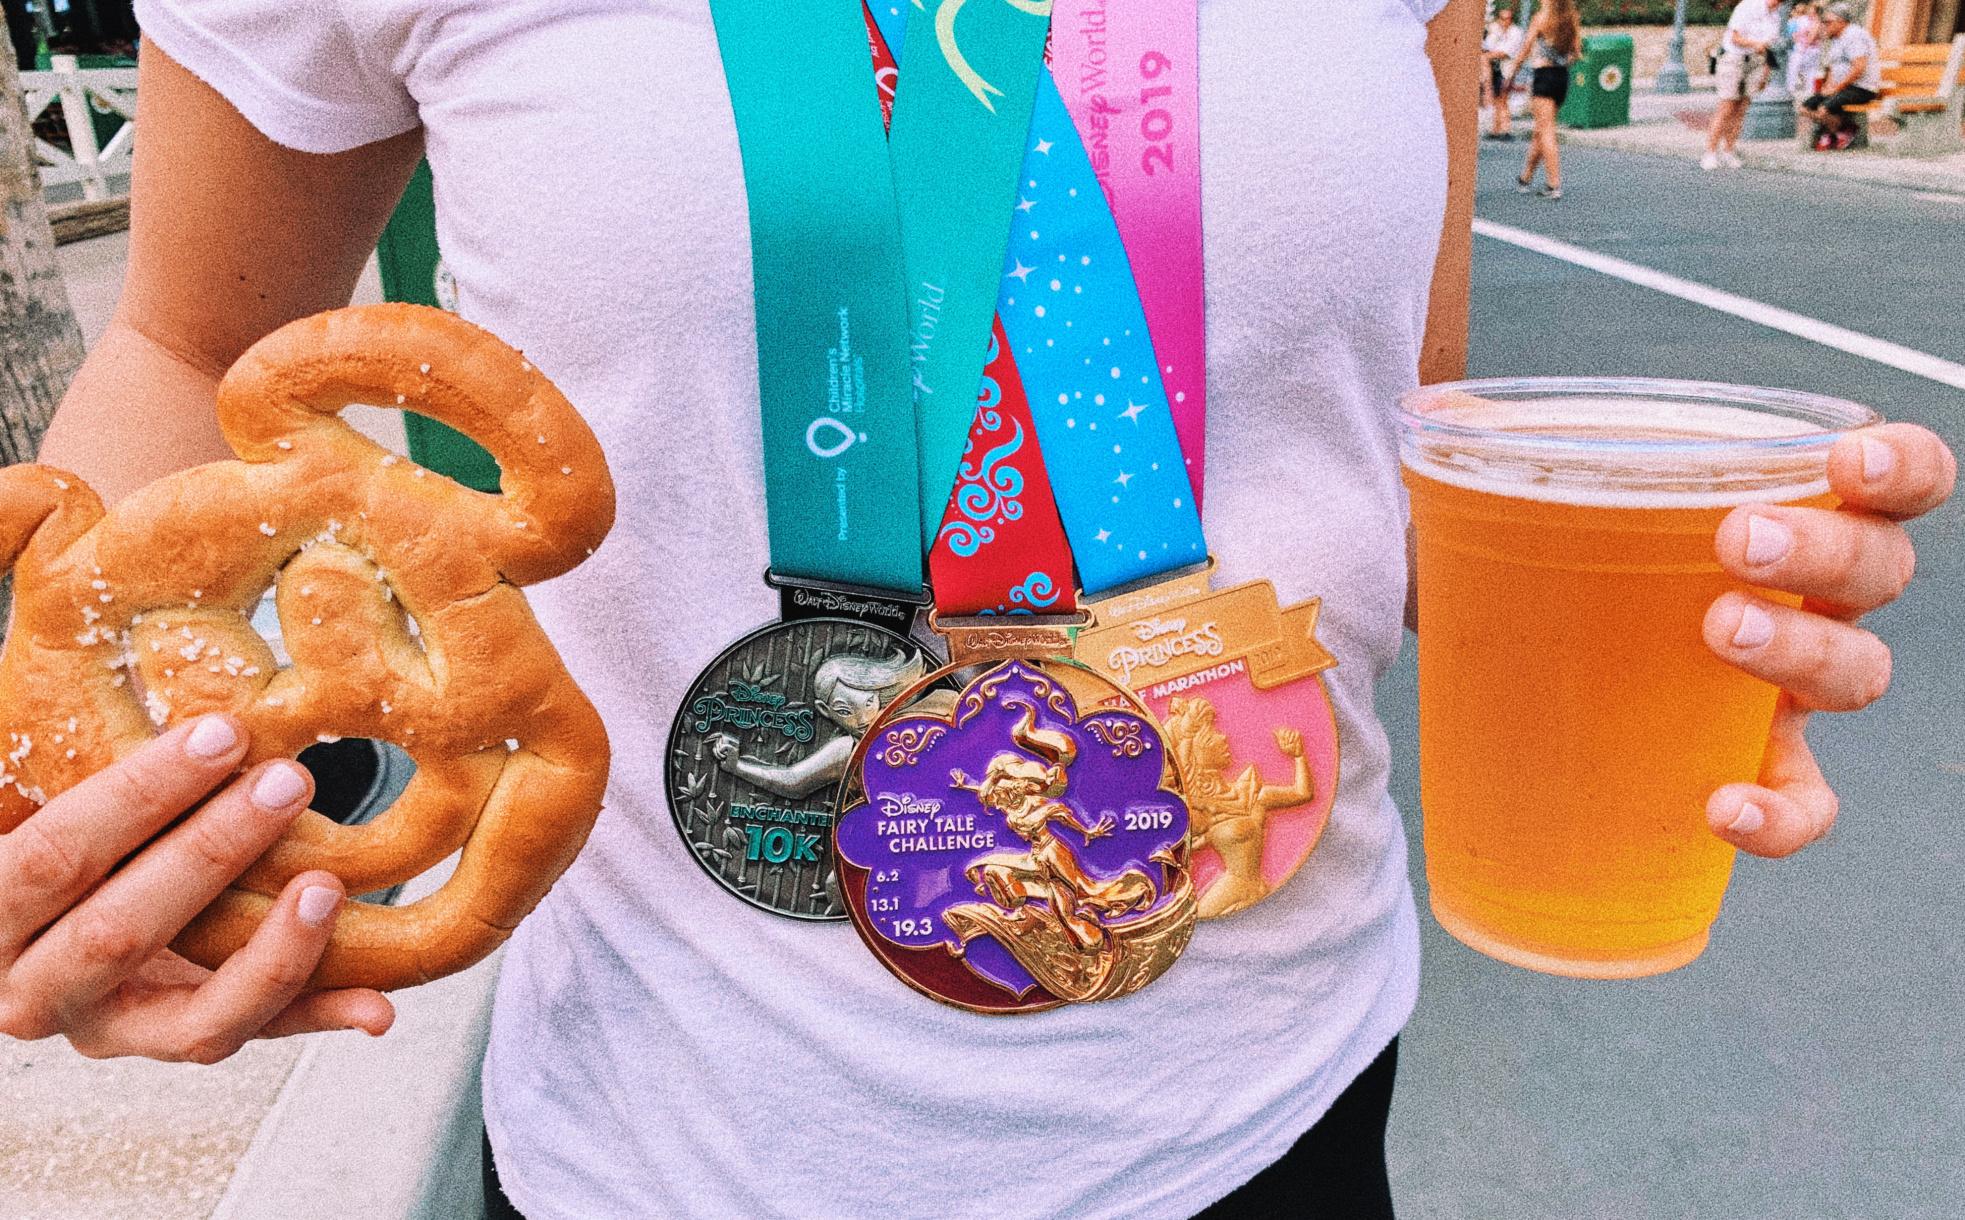 Disney Walt Disney World Itinerary Hollywood Studios pretzels and beer